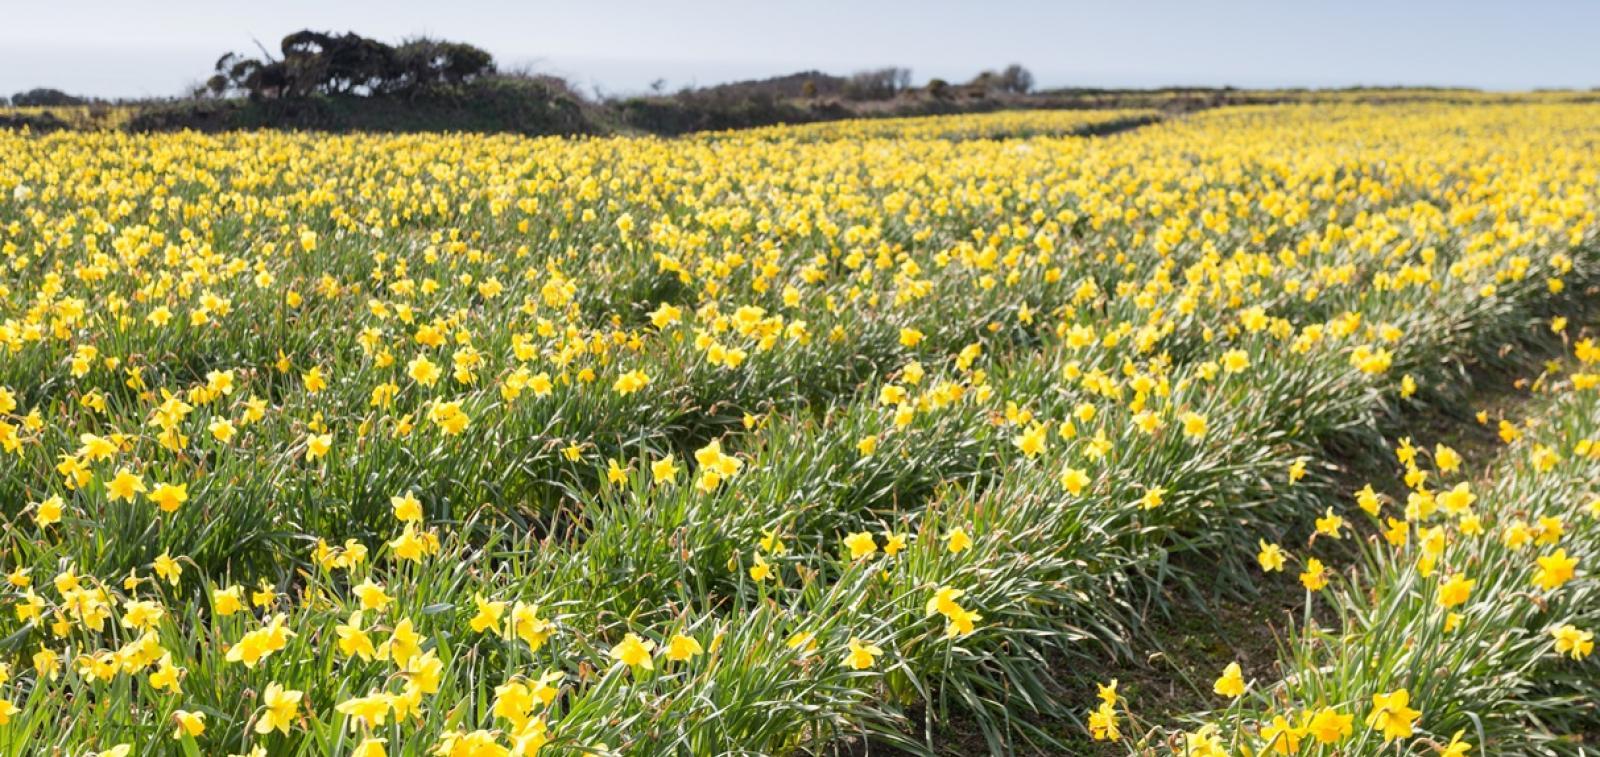 Field of daffodils